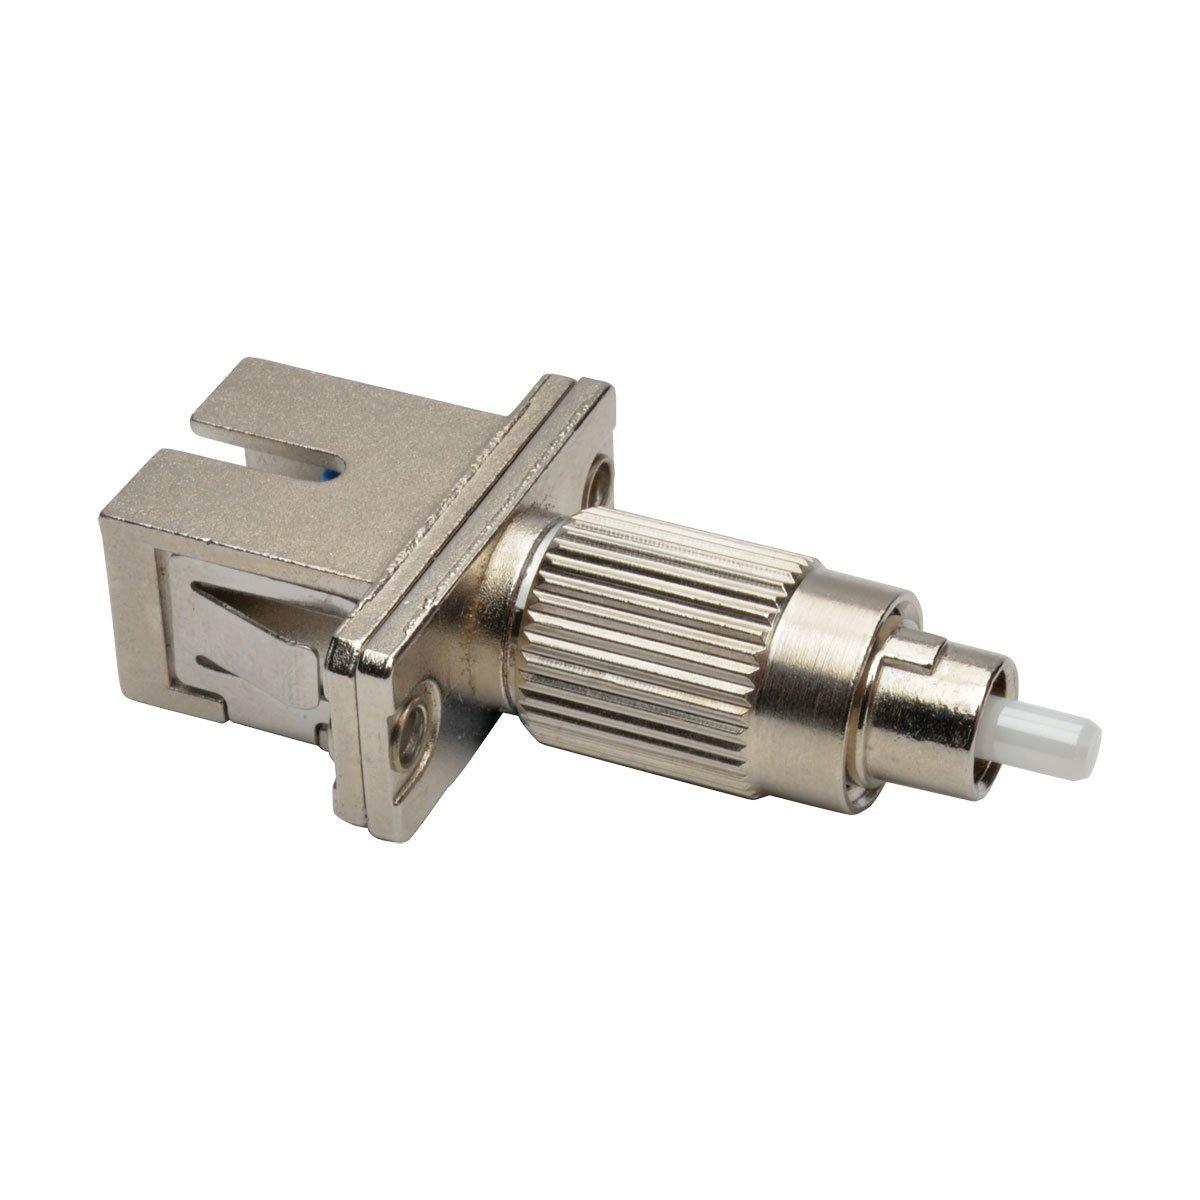 Tripp Lite Optical Fiber Cable Tester Adapter FC/SC 9/125 M/F (T020-001-SC9)